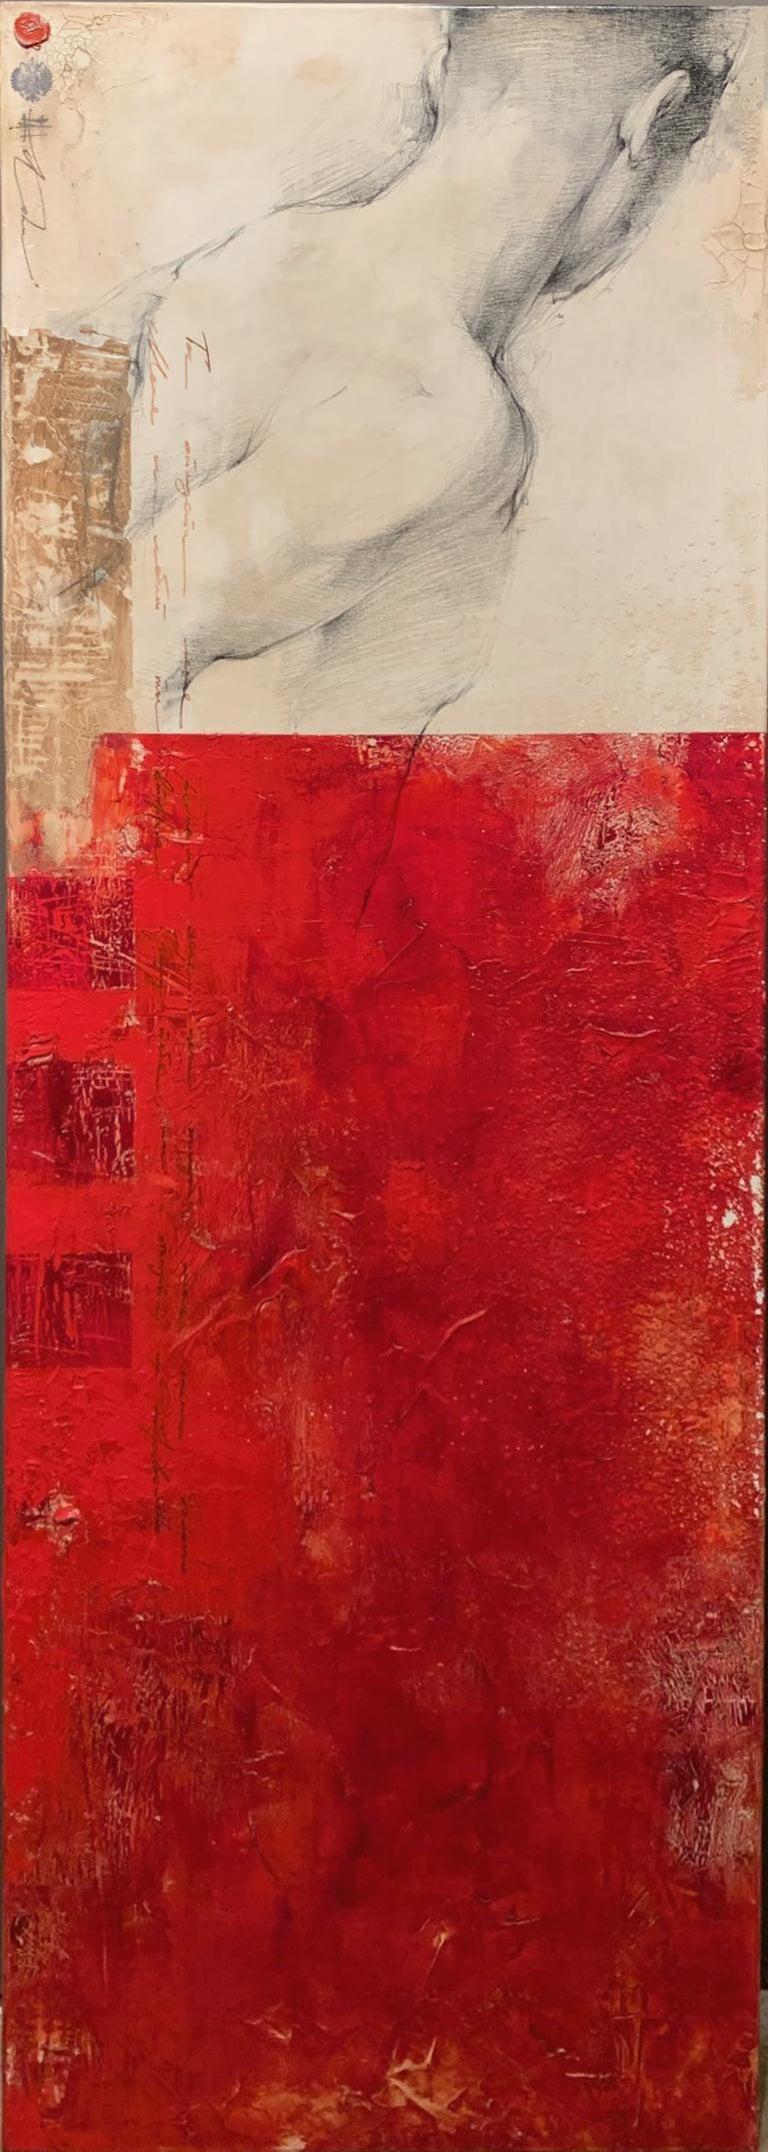 "Andre Kohn. ""Let me go"" Original mixed media, Figurative nude, red oil painting  - Mixed Media Art by Andre Kohn"